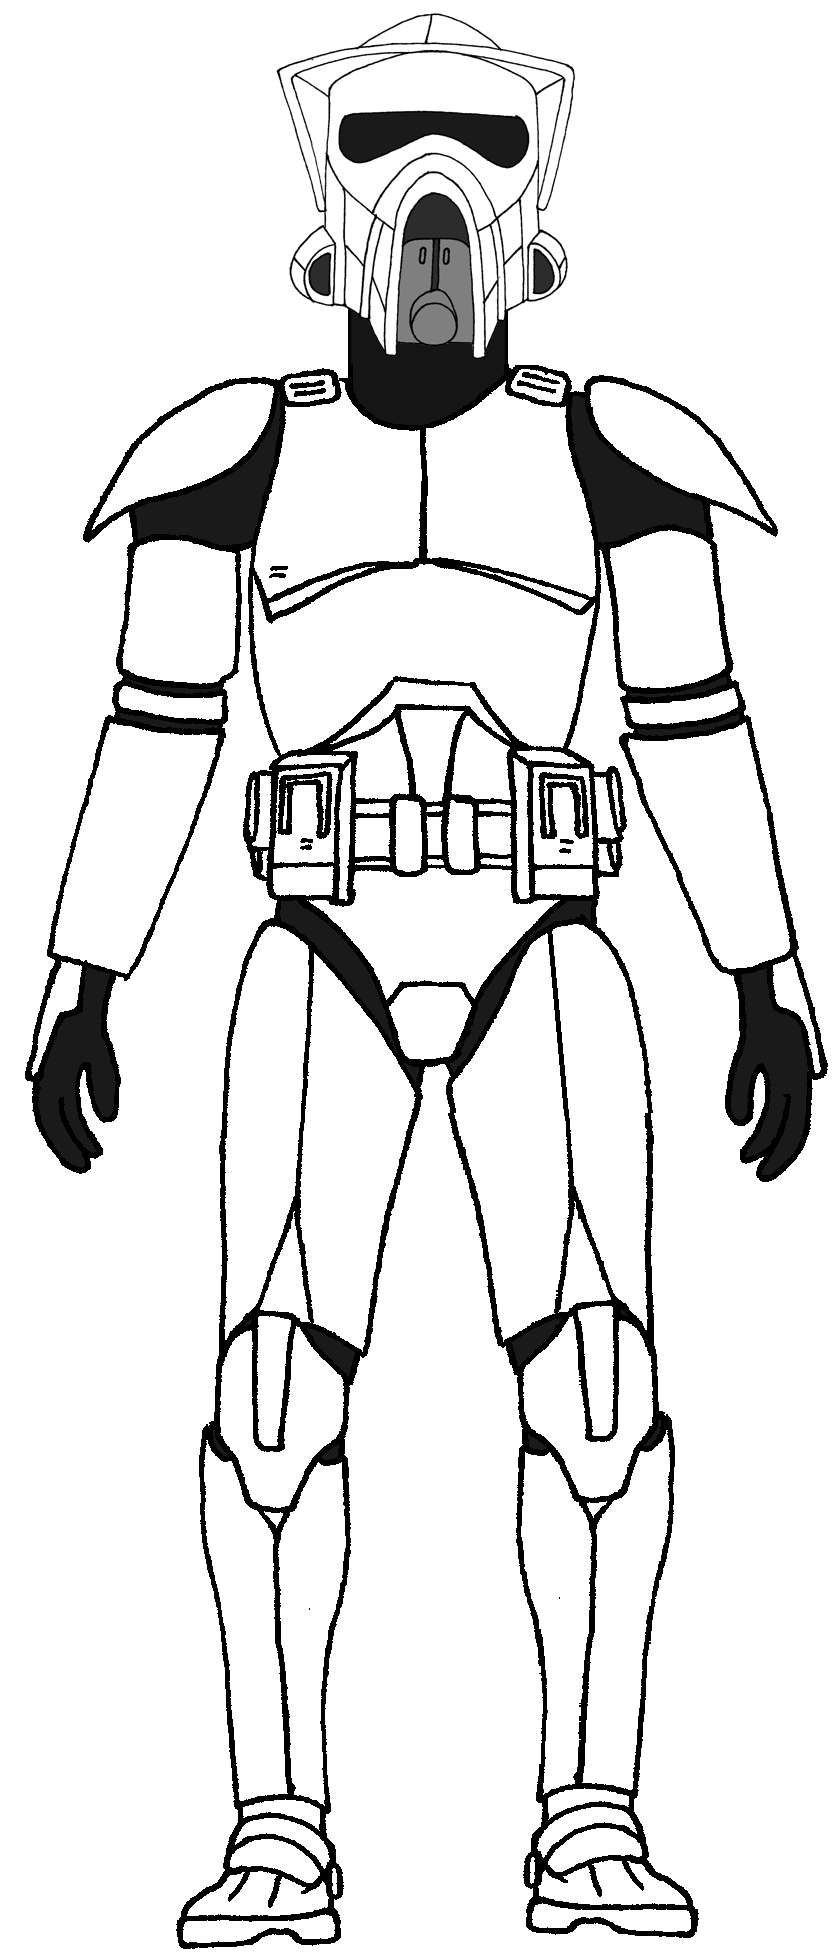 Clone Scout Trooper Phase 1 Star Wars Clone Wars Star Wars Drawings Star Wars Captain